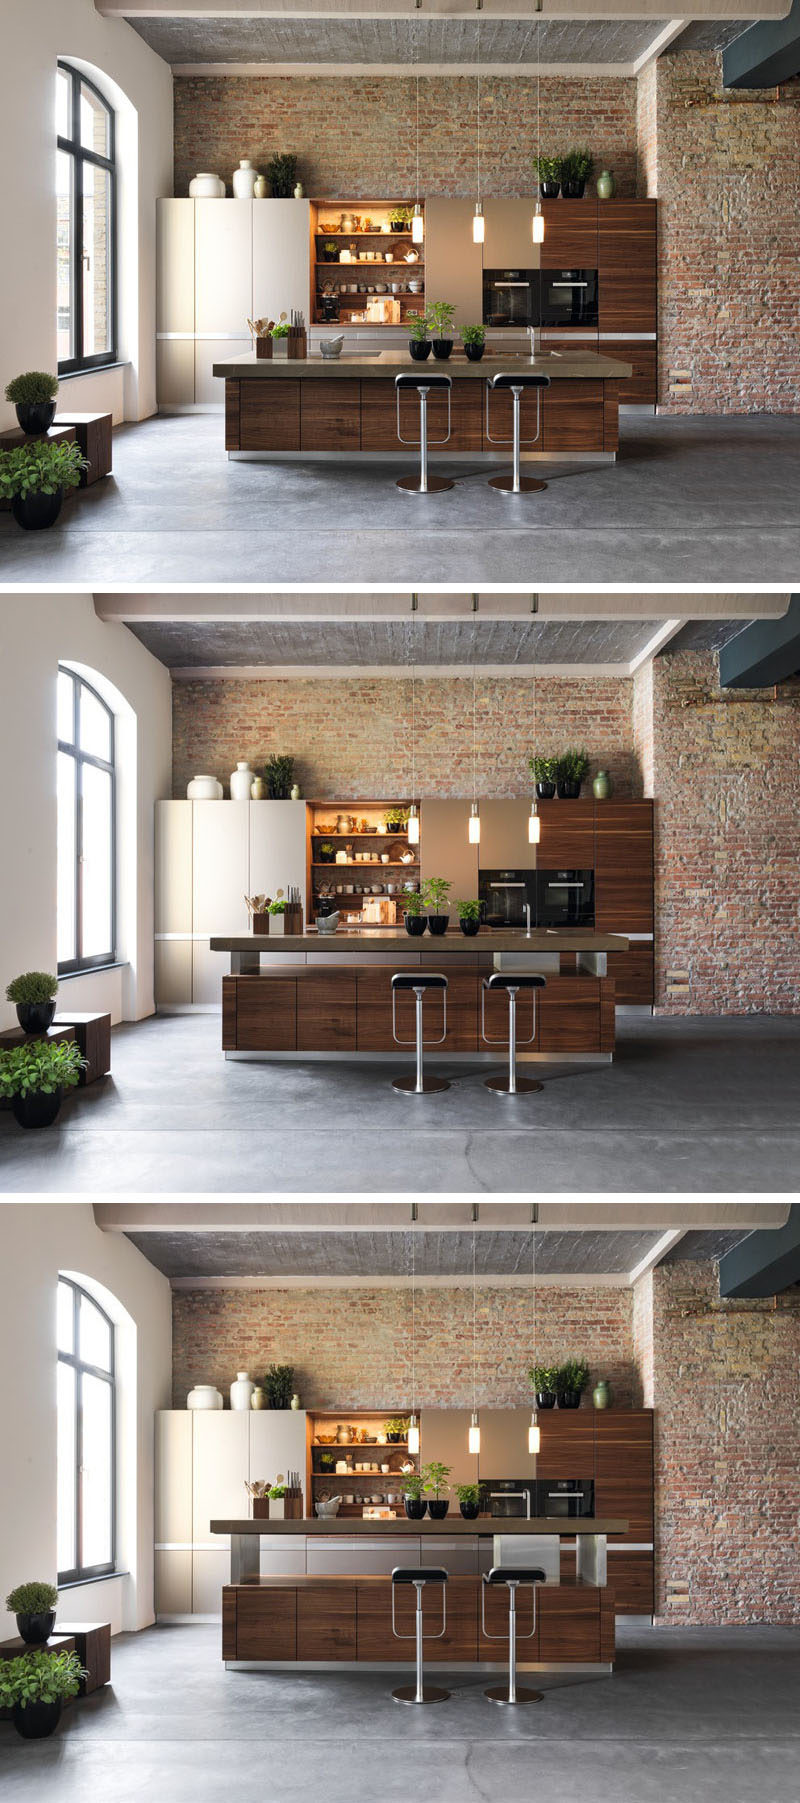 Kitchen Design Idea - Adjustable Height Kitchen Island